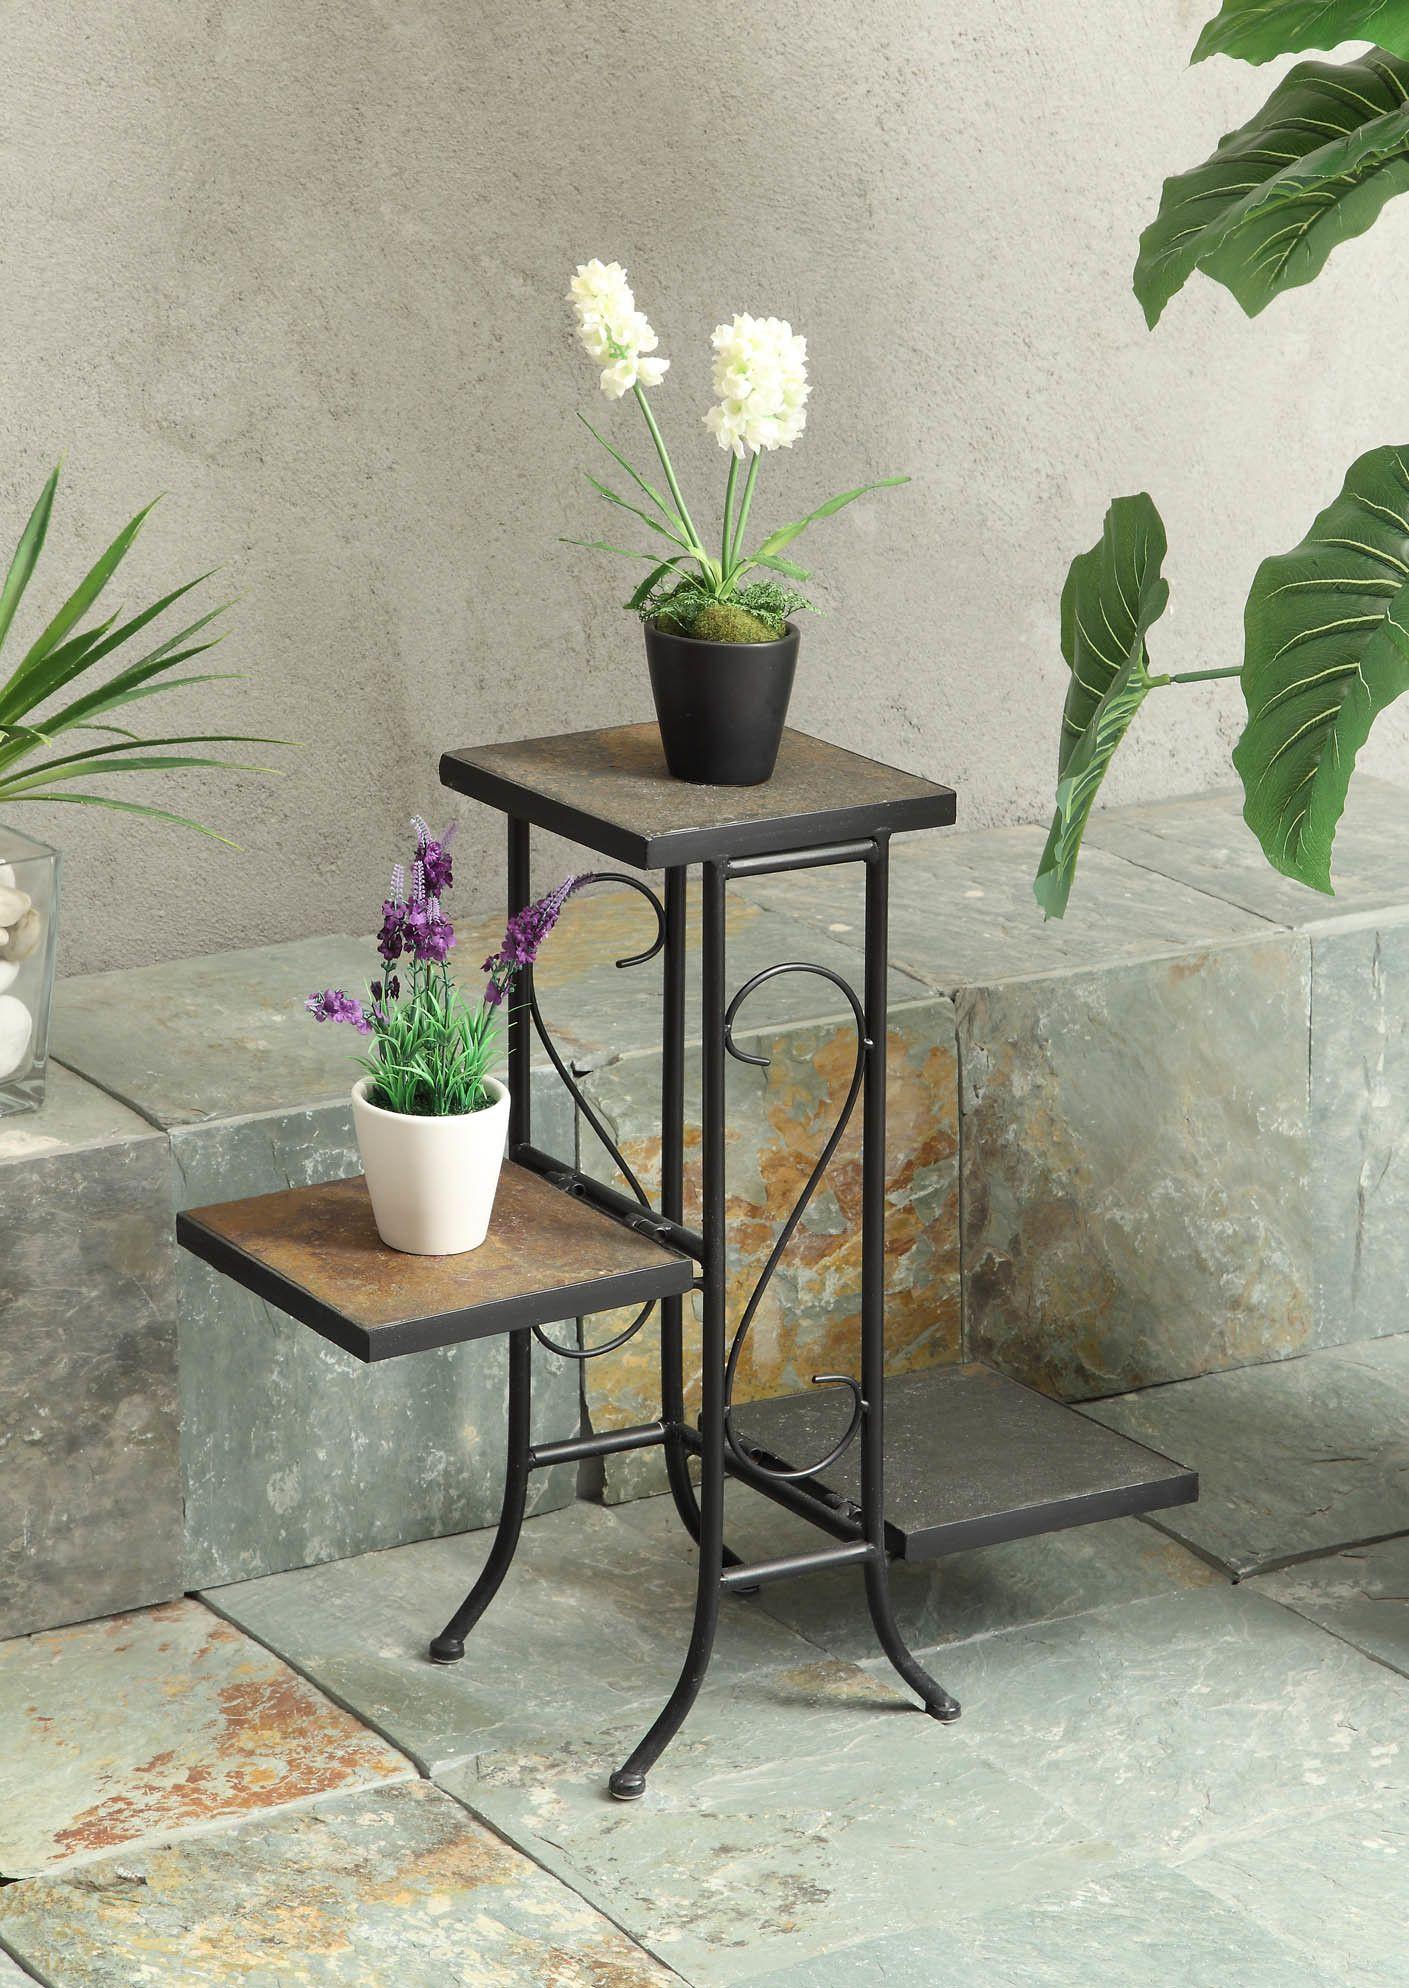 Attractive 4D Concepts 3 Tier Square Planter Stand U0026 Reviews   Wayfair